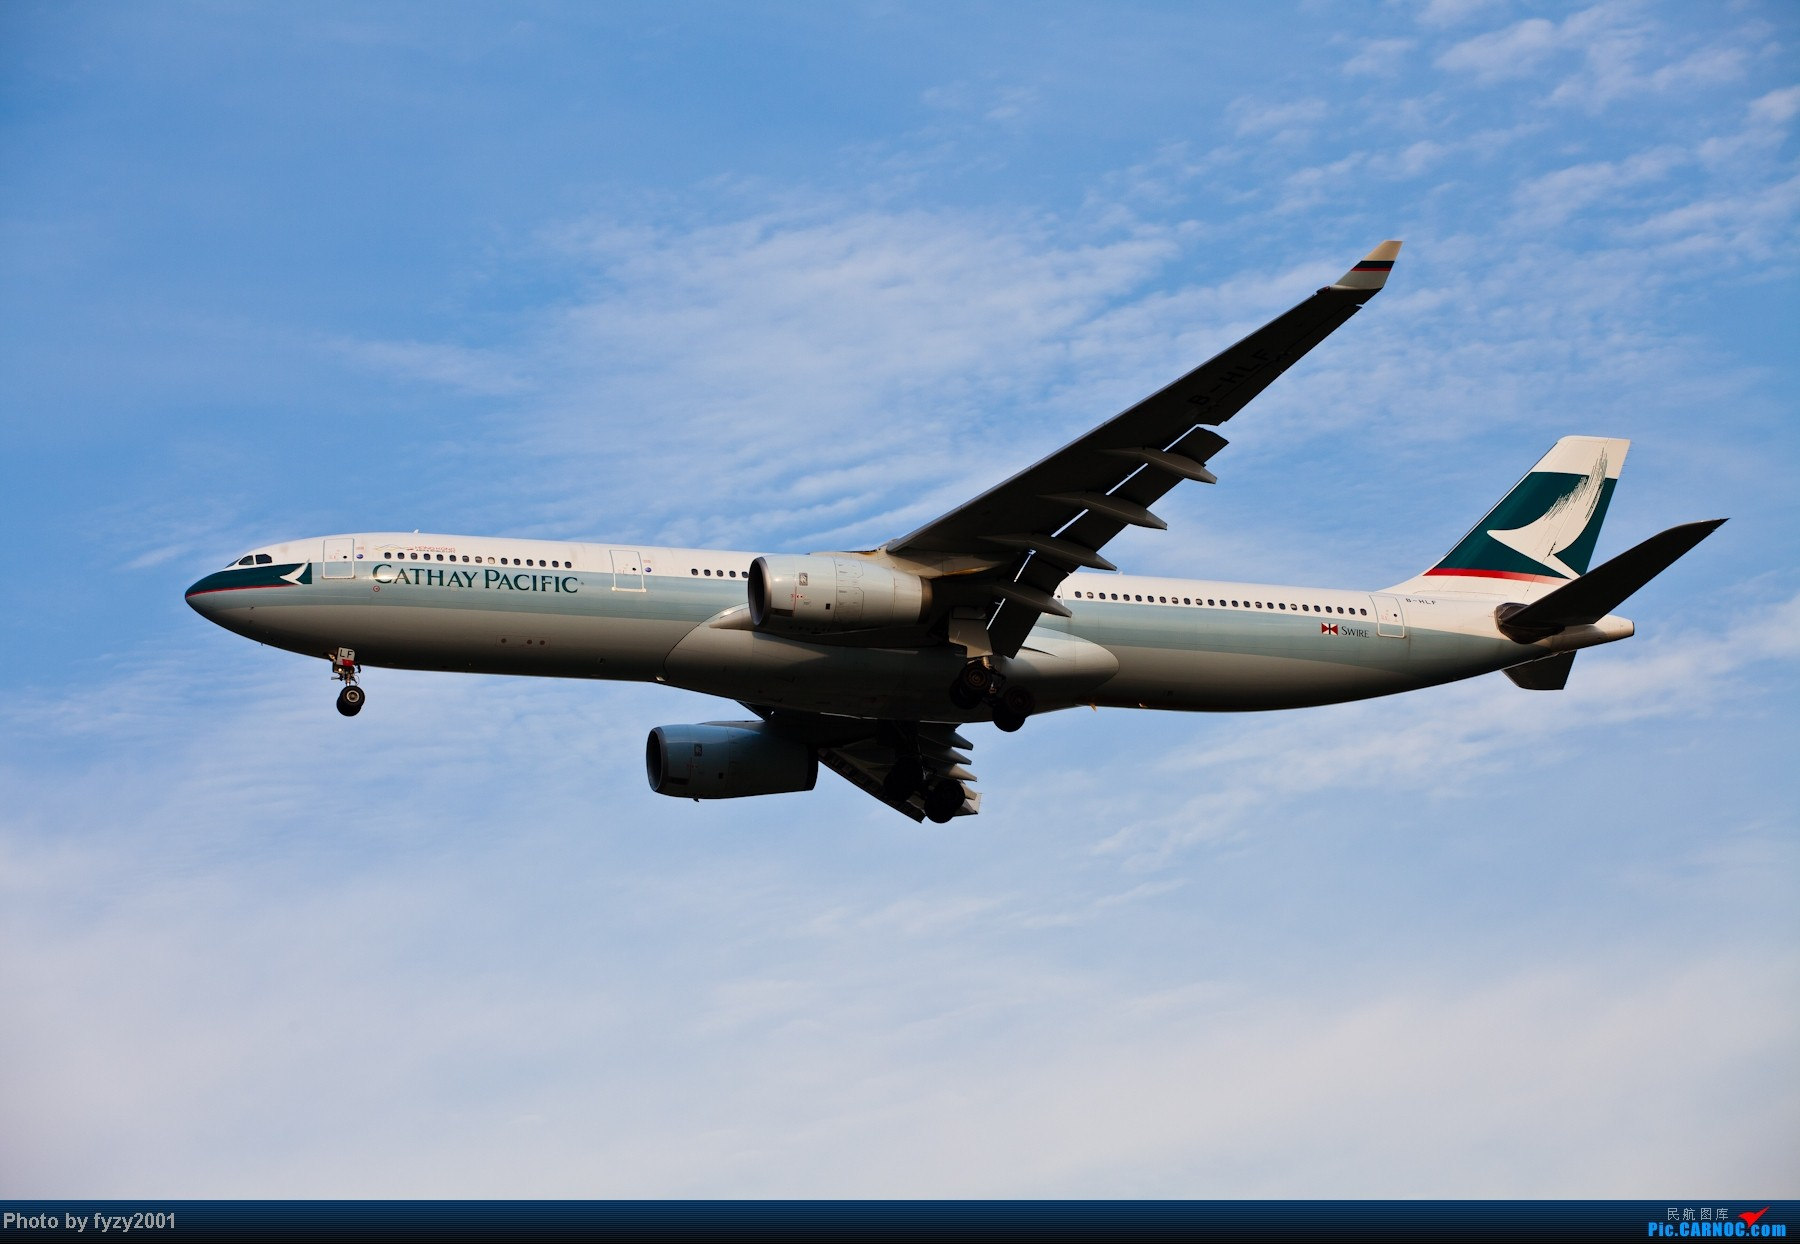 Re:[原创][无锡西站]长假PVG蹲守~~~~只发大图,多图杀猫~~~~ AIRBUS A330-300 B-HLF 中国上海浦东机场